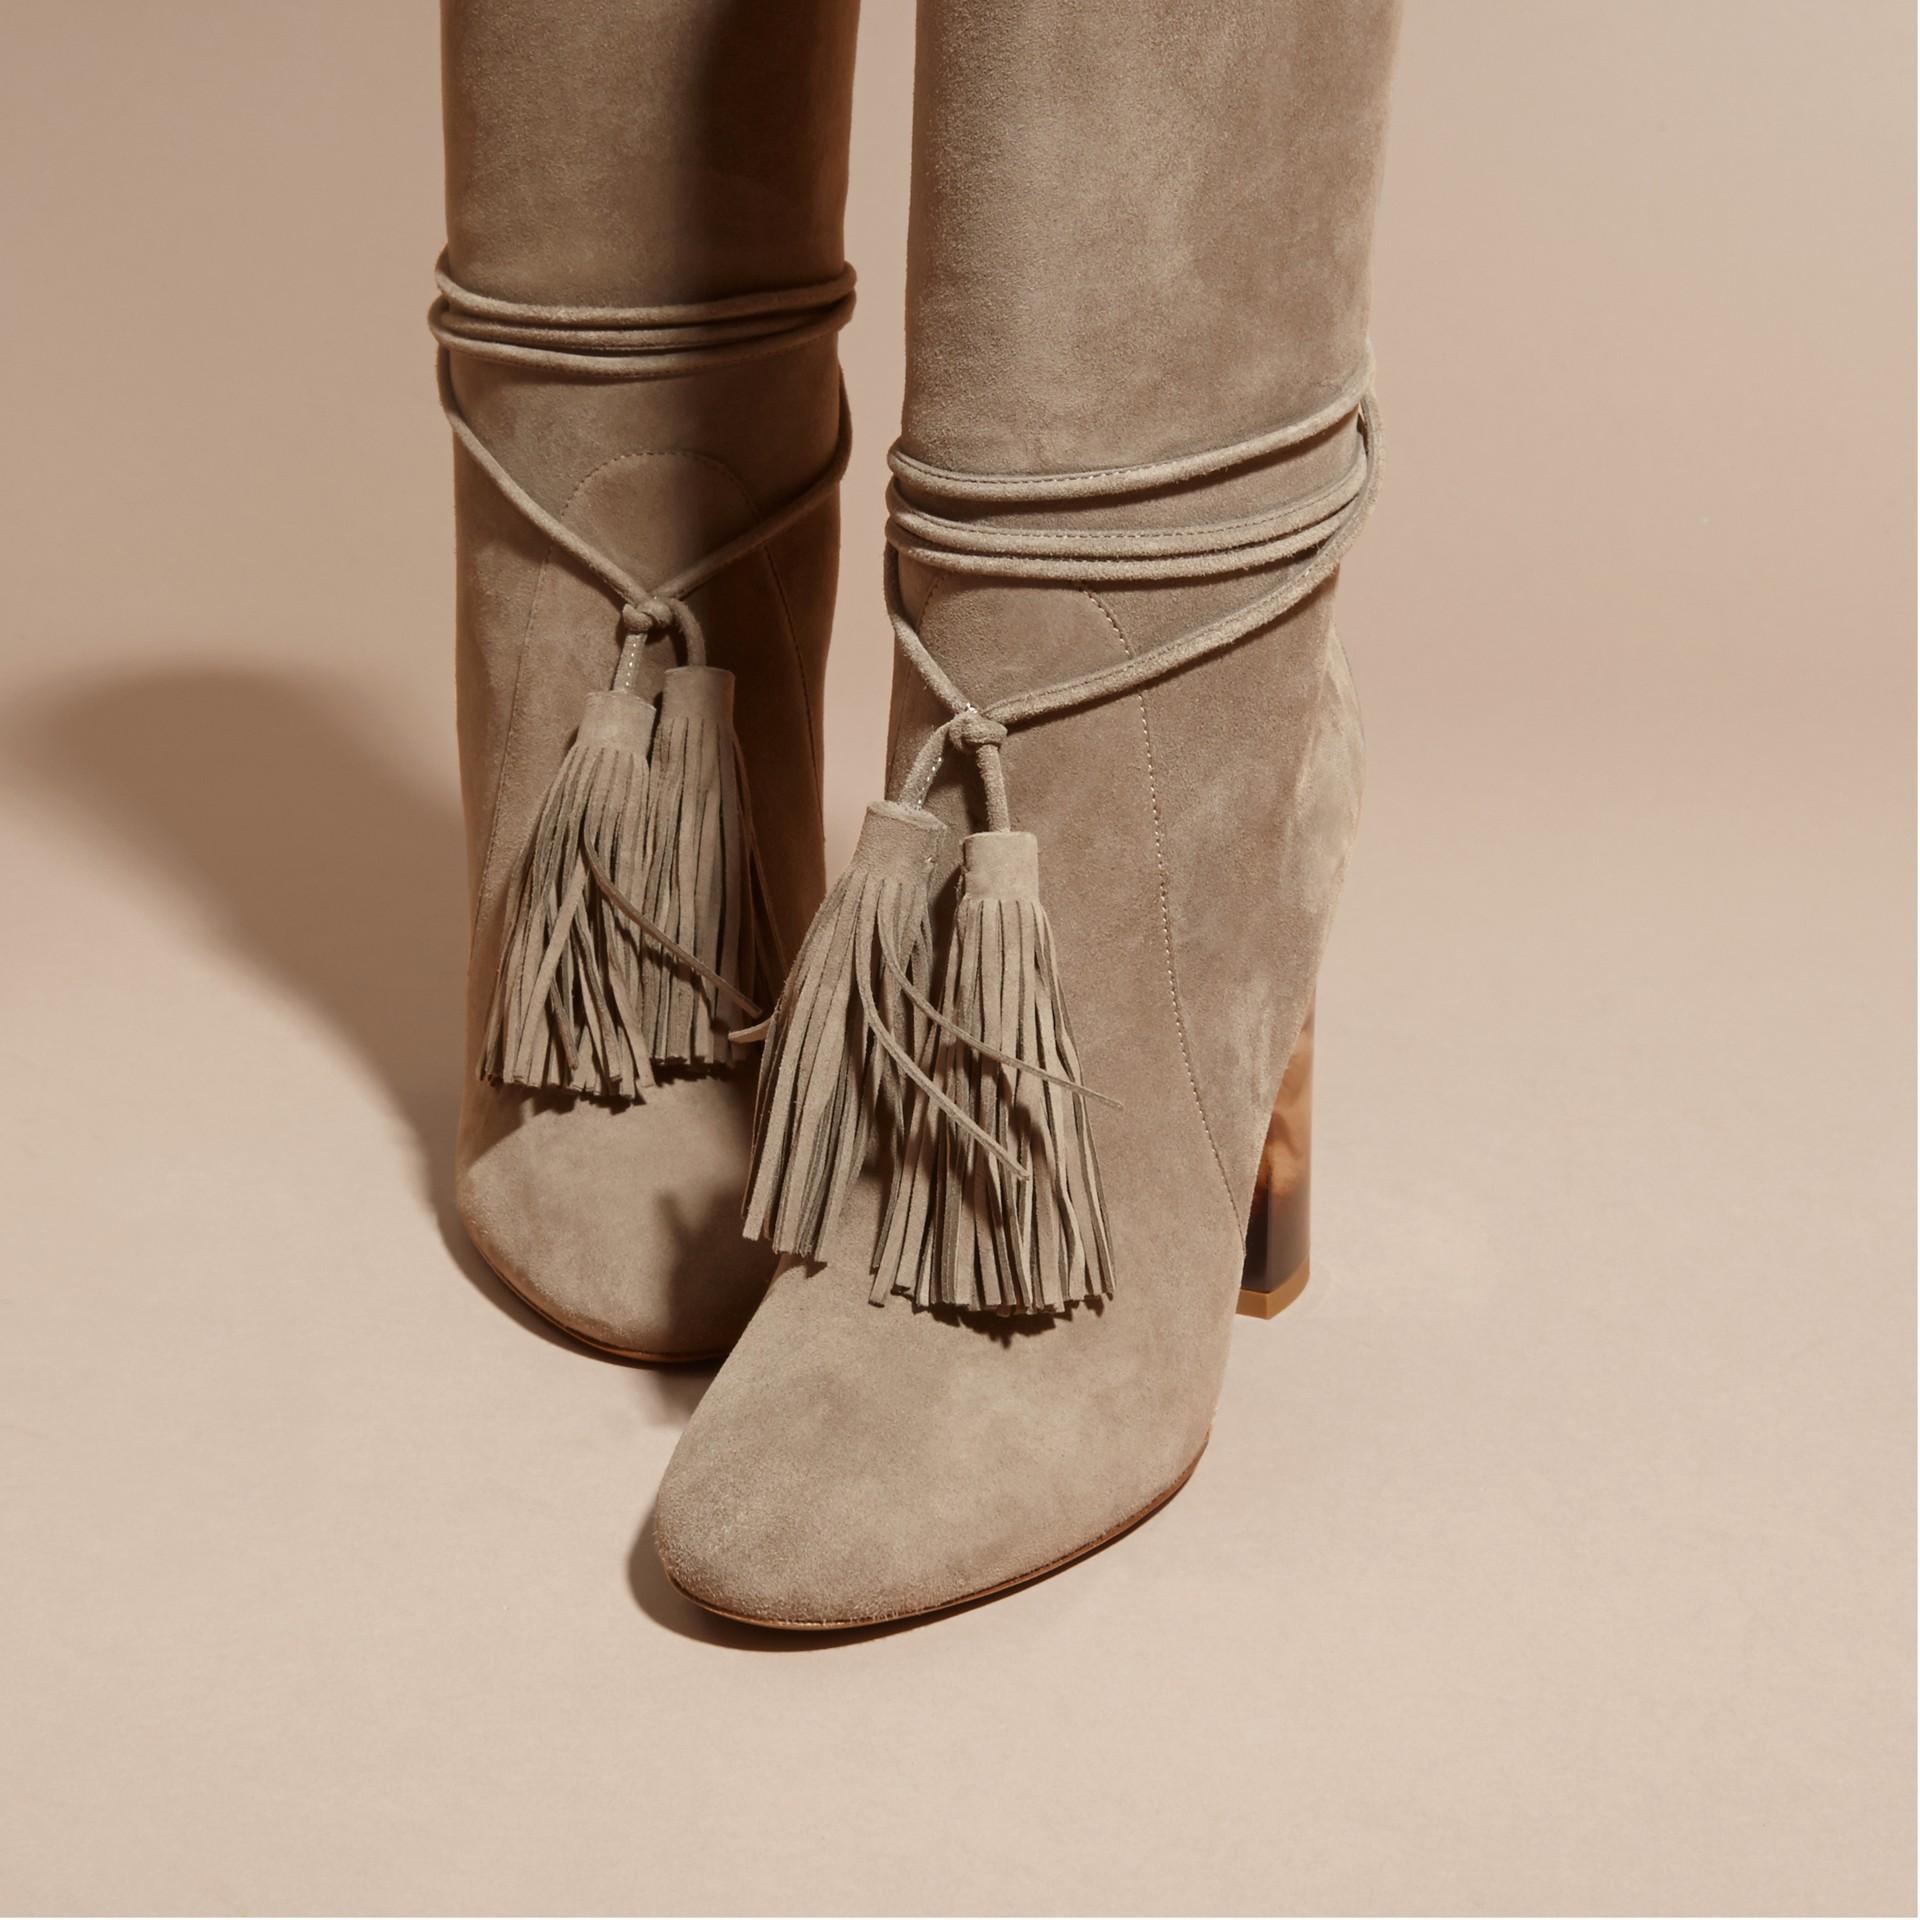 Dark heather melange Tasselled Suede Pull-on Boots - gallery image 2